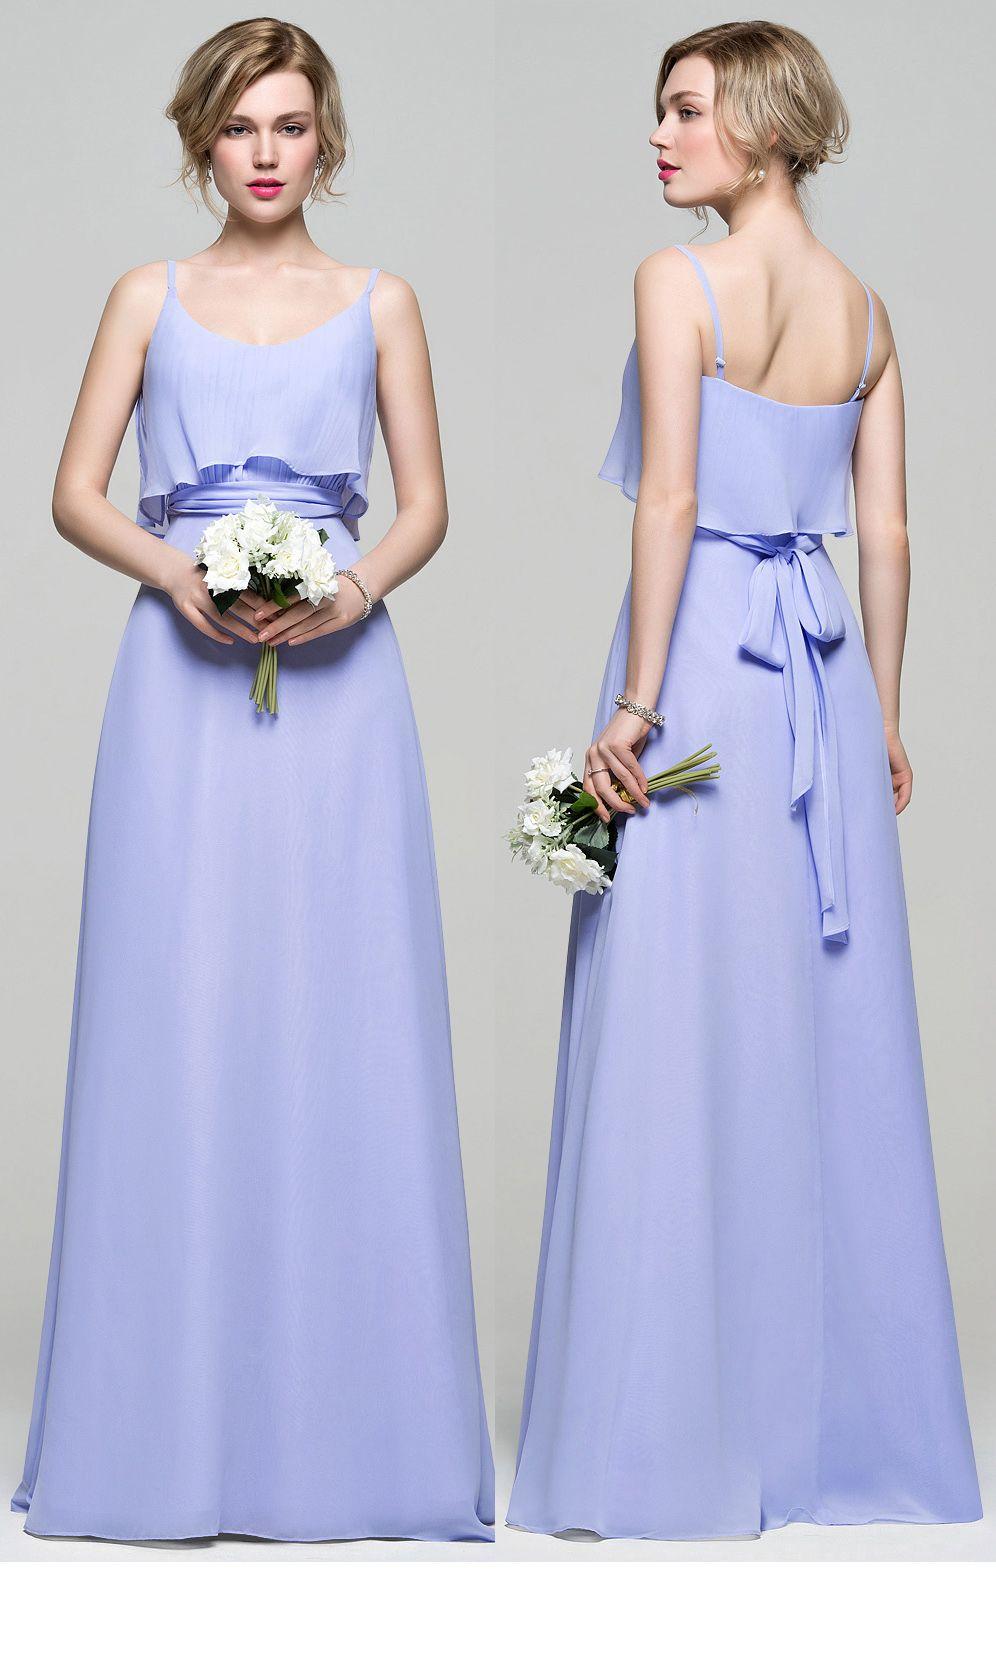 Lavender bridesmaid dress jjshouse jjshousebridesmaiddress